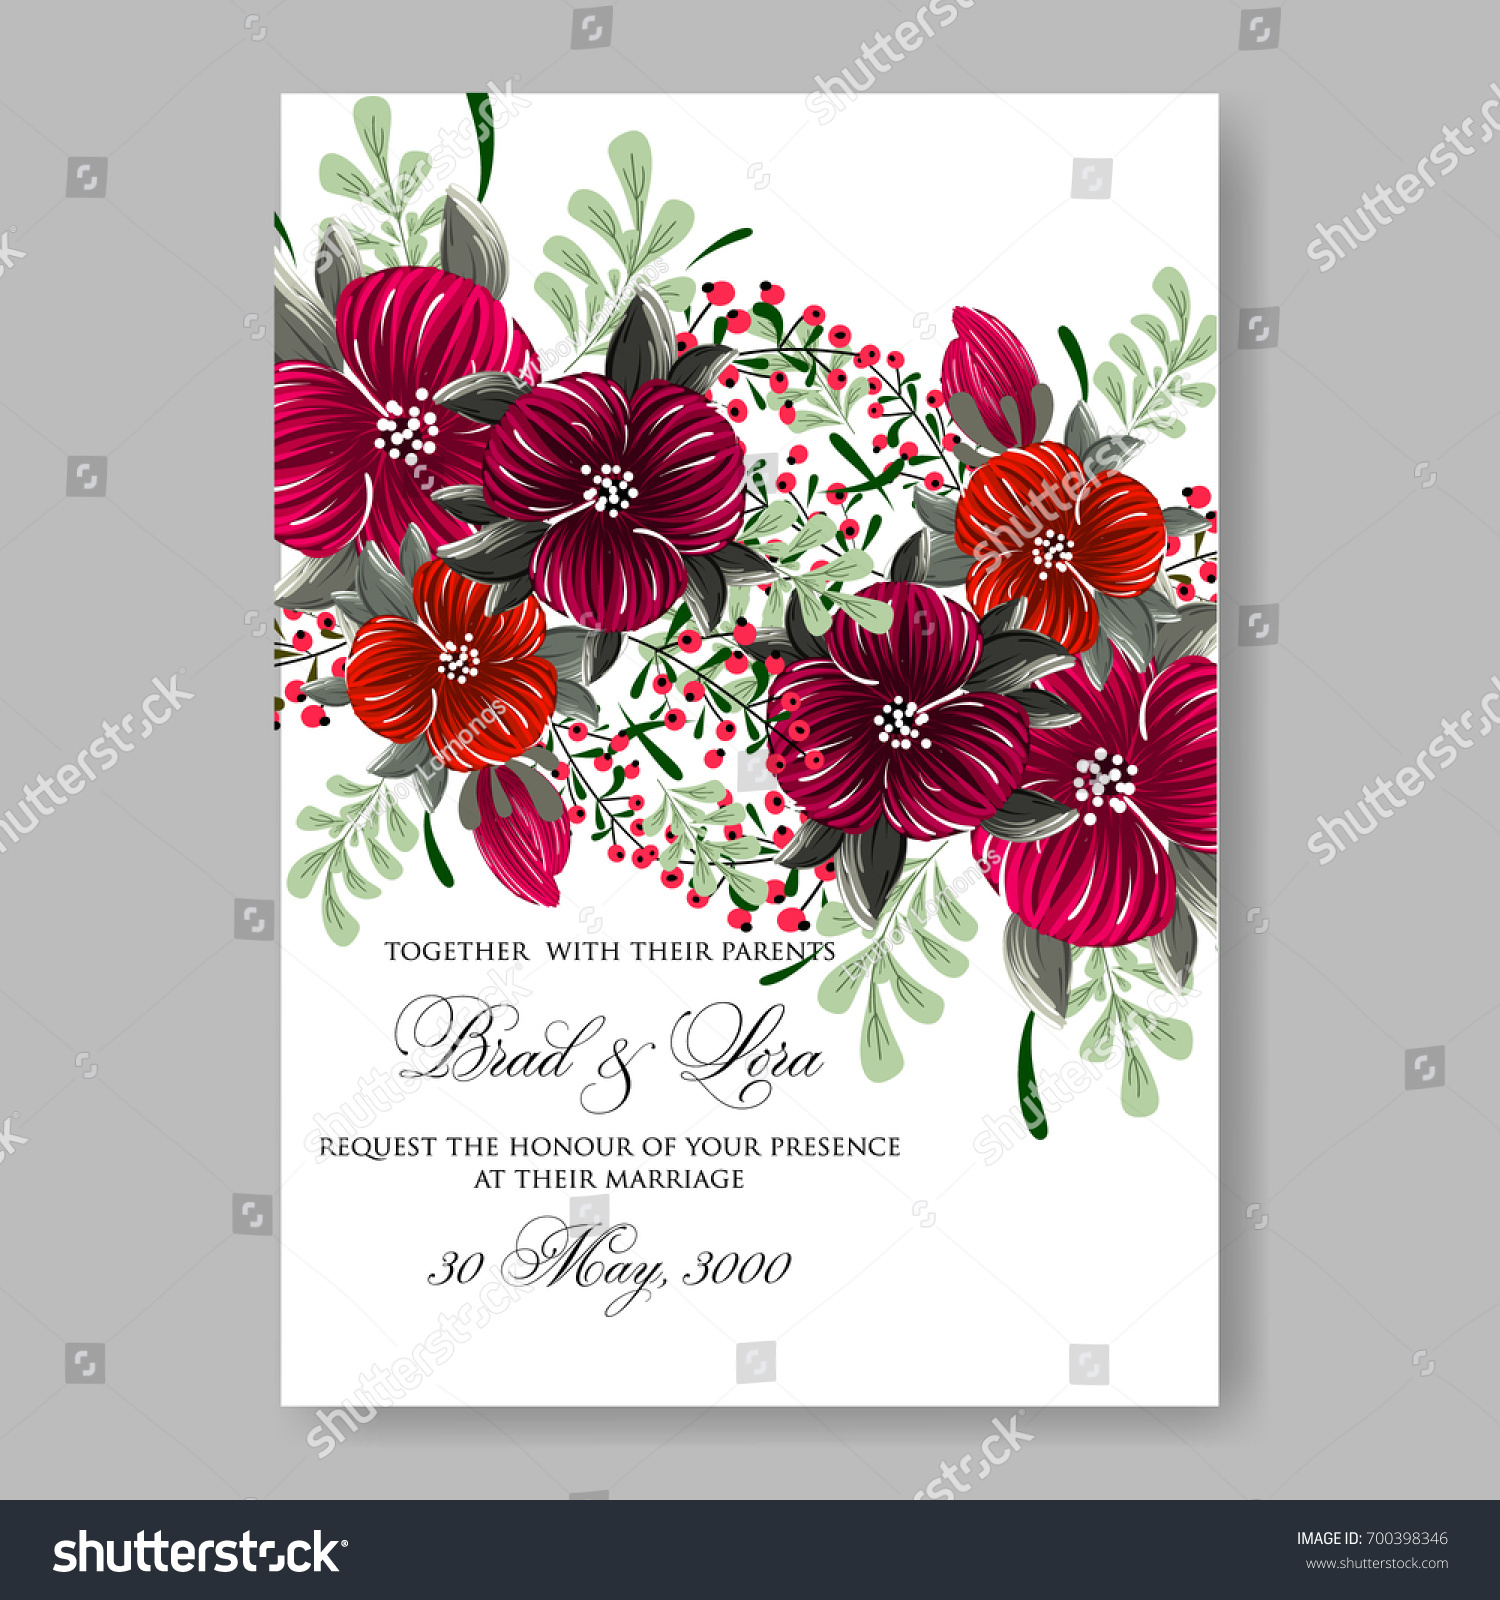 Wedding Invitation Peony Rose Rununculus Anemone Stock Vector ...